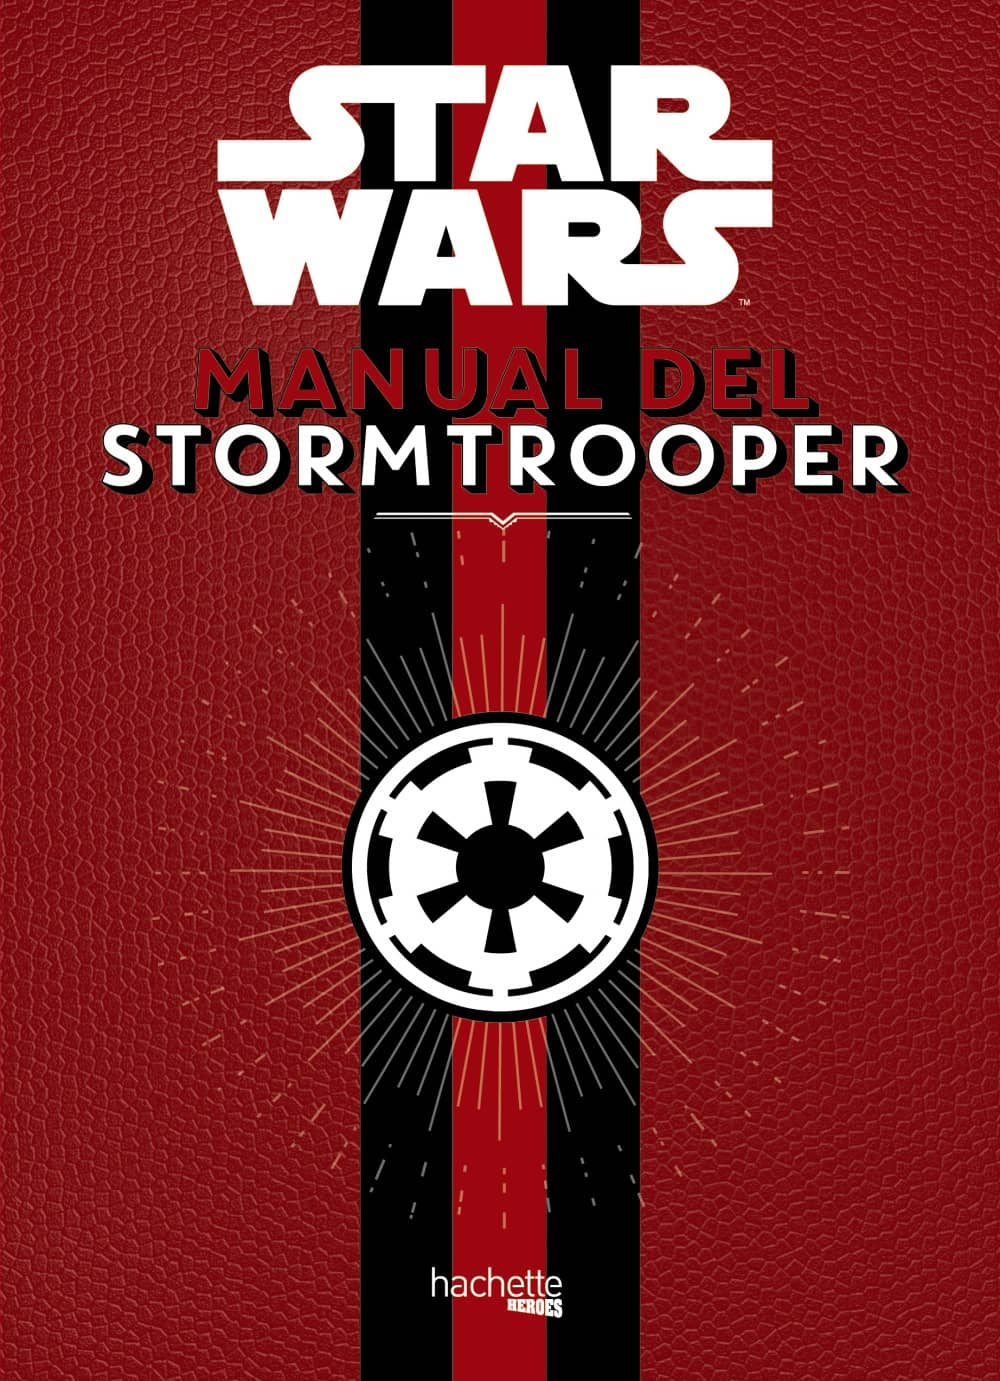 STAR WARS. MANUAL DEL STORMTROOPER